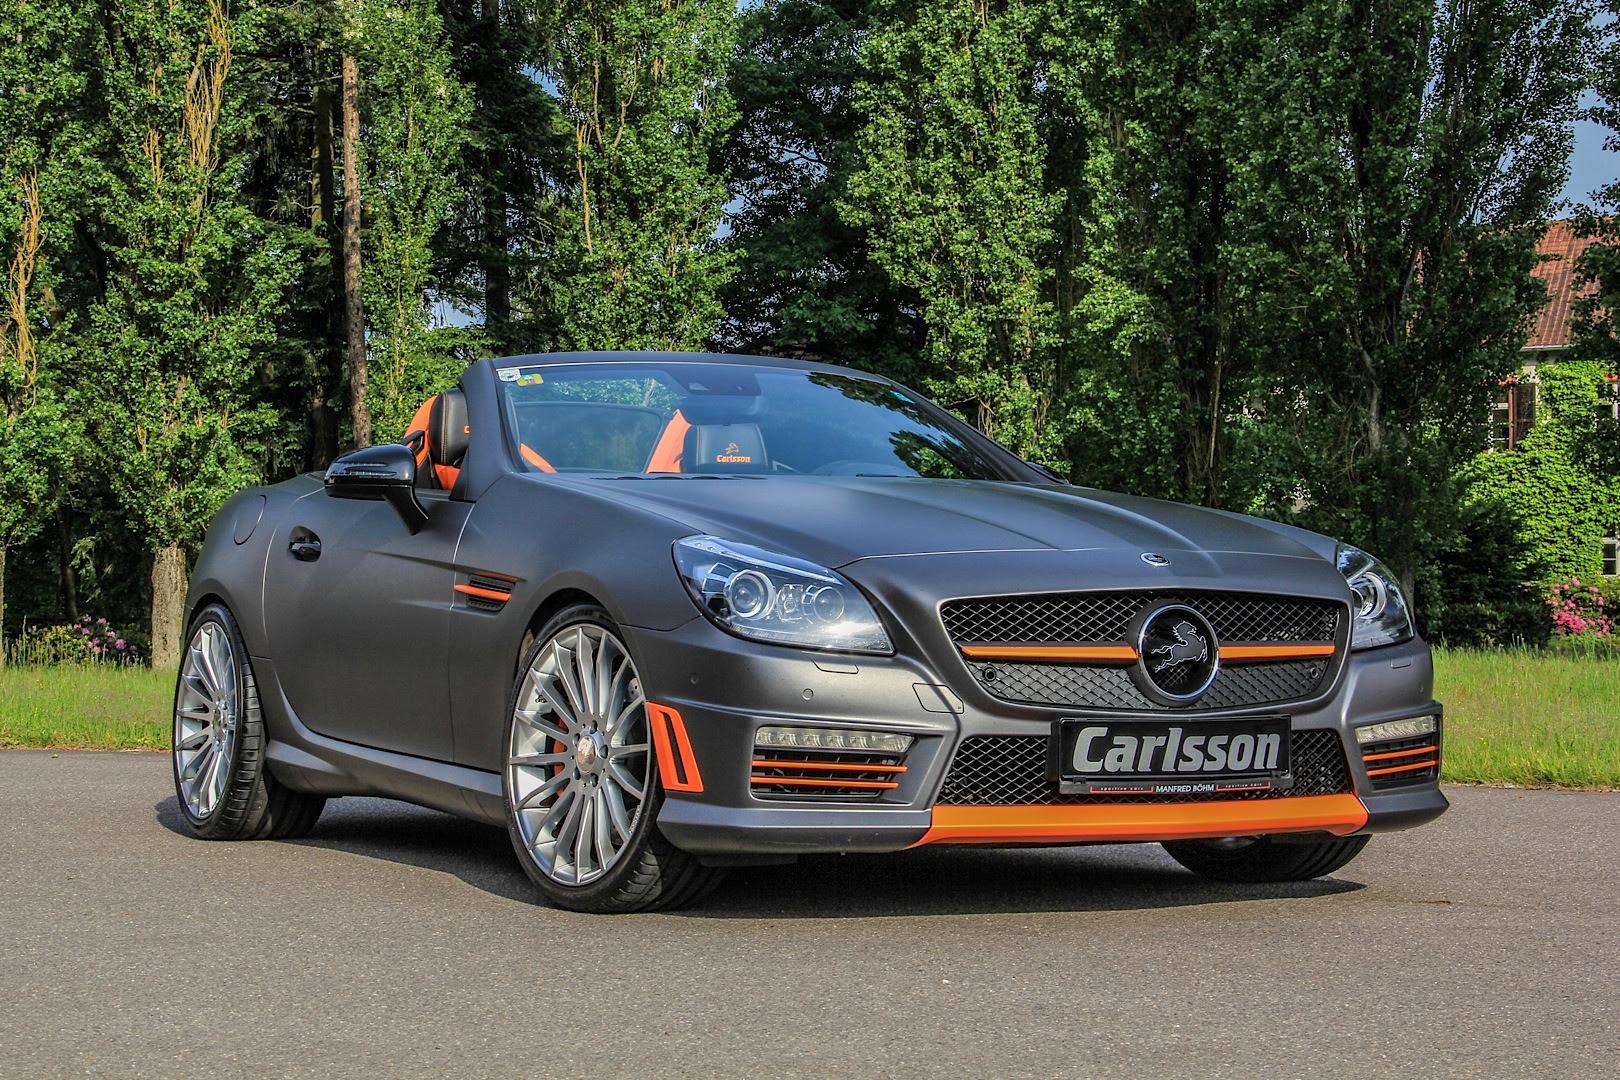 Mercedes SLK 55 AMG Gets Carlsson Interior with Orange and ...